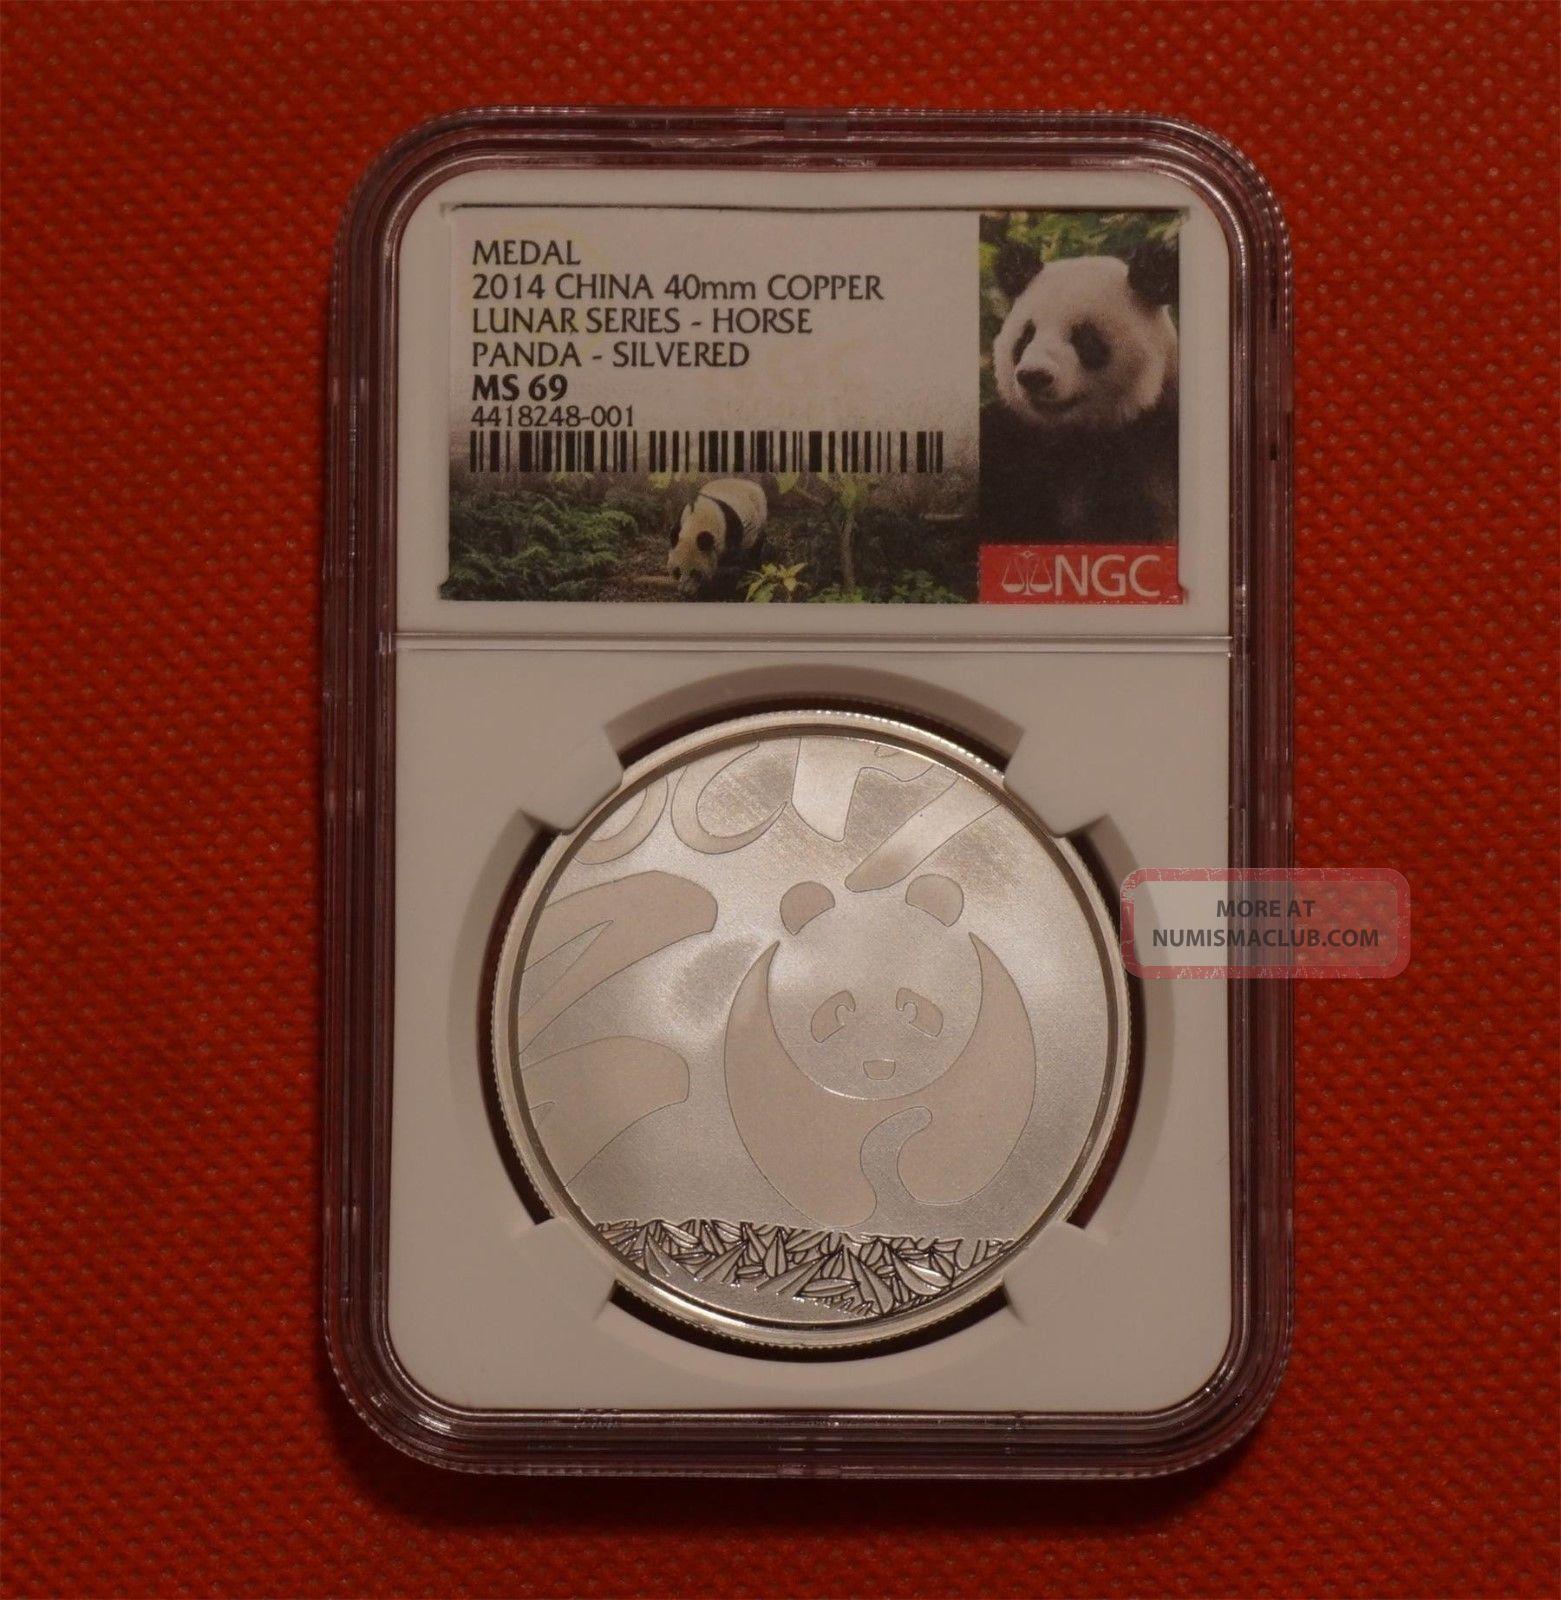 Shanghai 2014 Silver Plated Copper Lunar Horse Panda China Coin - Ngc 69 Coins: World photo